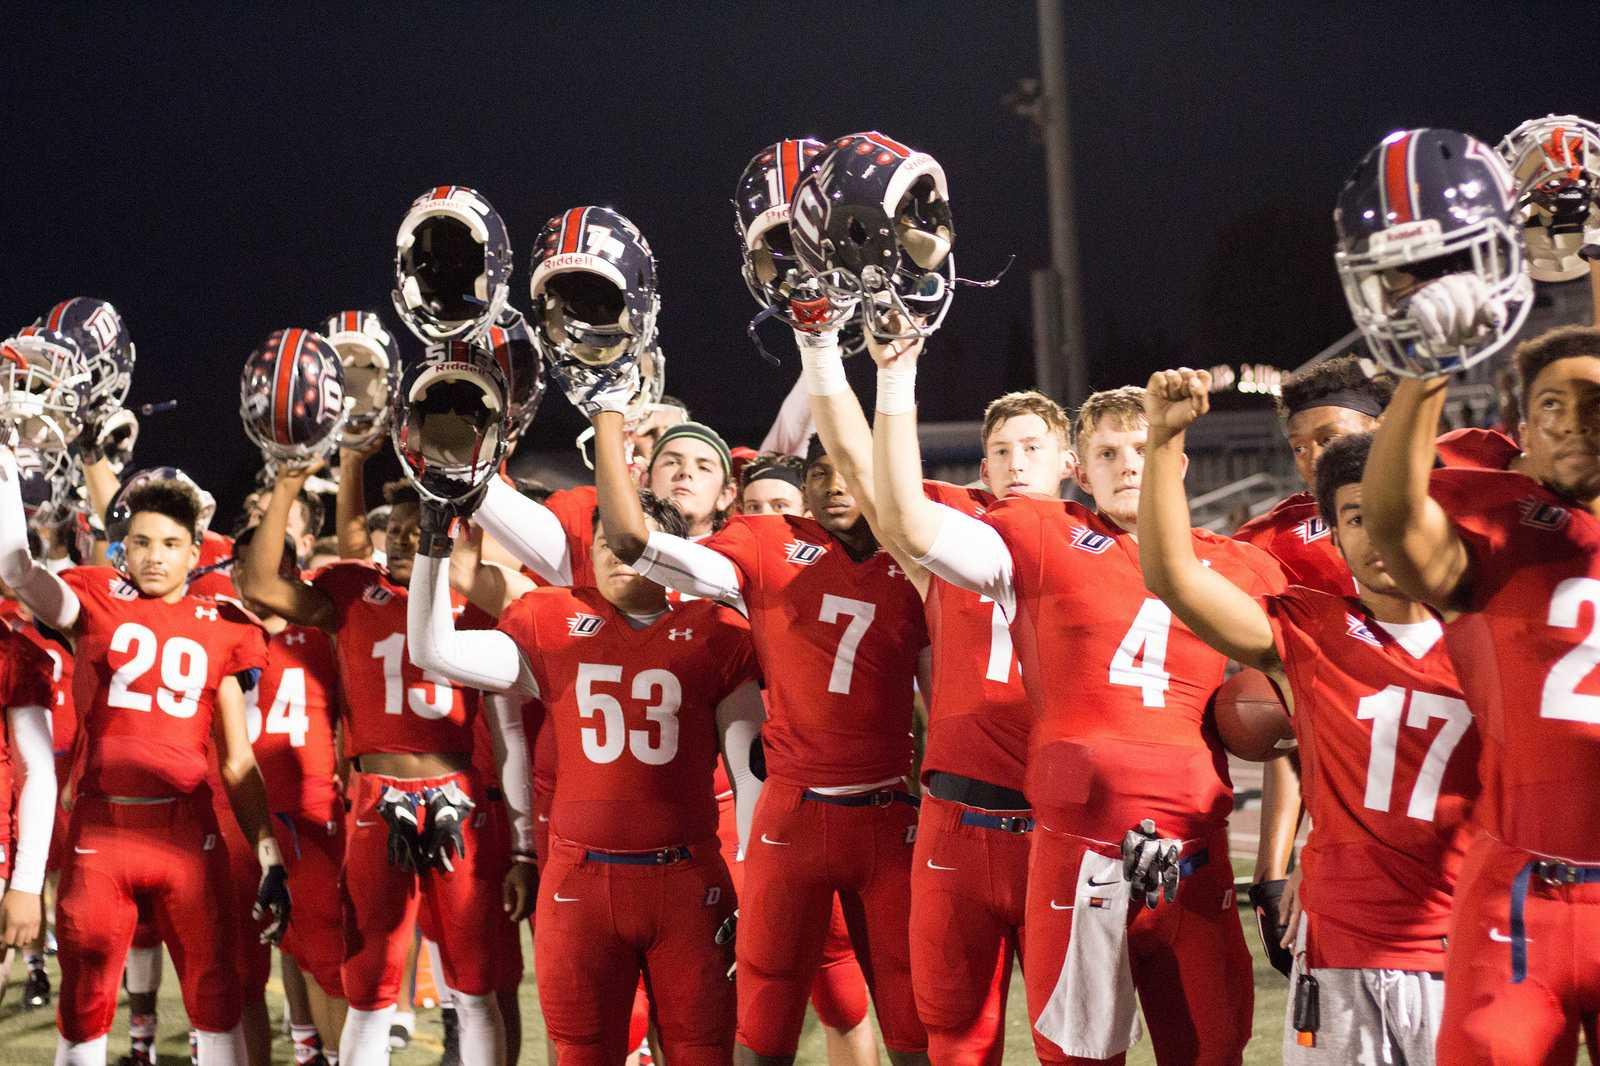 Ryan Hair DHS football players raise their helmets during the National Anthem.